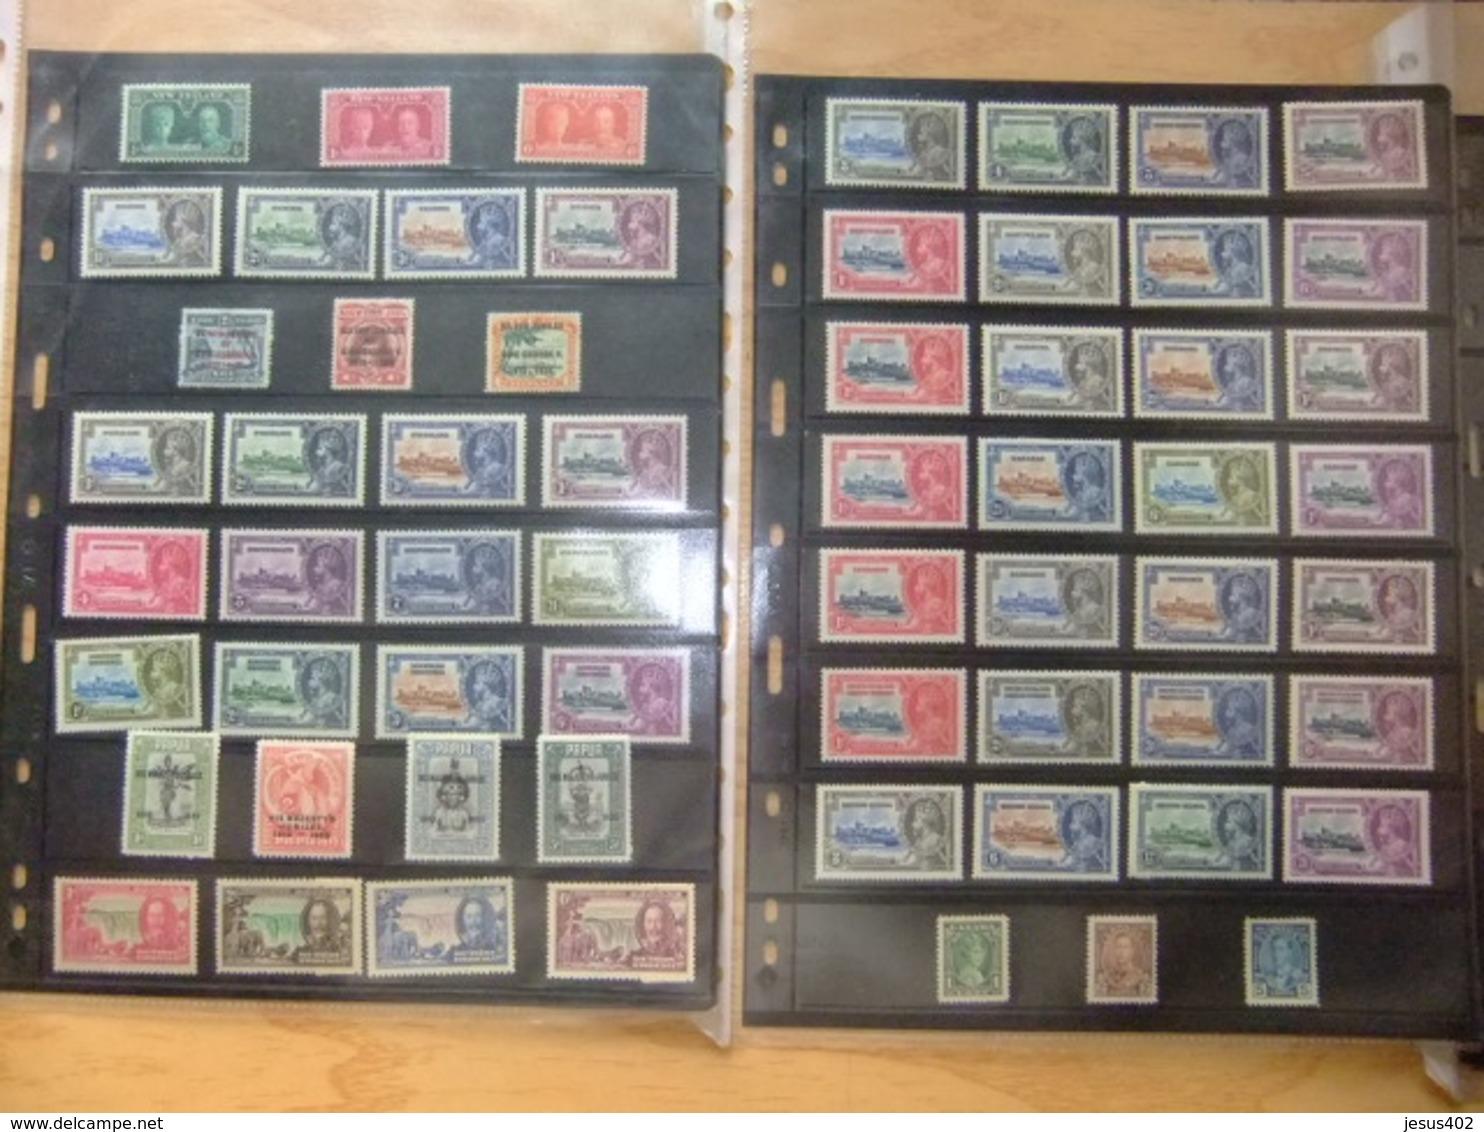 Jubilé De George V 1935 Série Complète MNH Neuve LUXE - Colecciones Completas